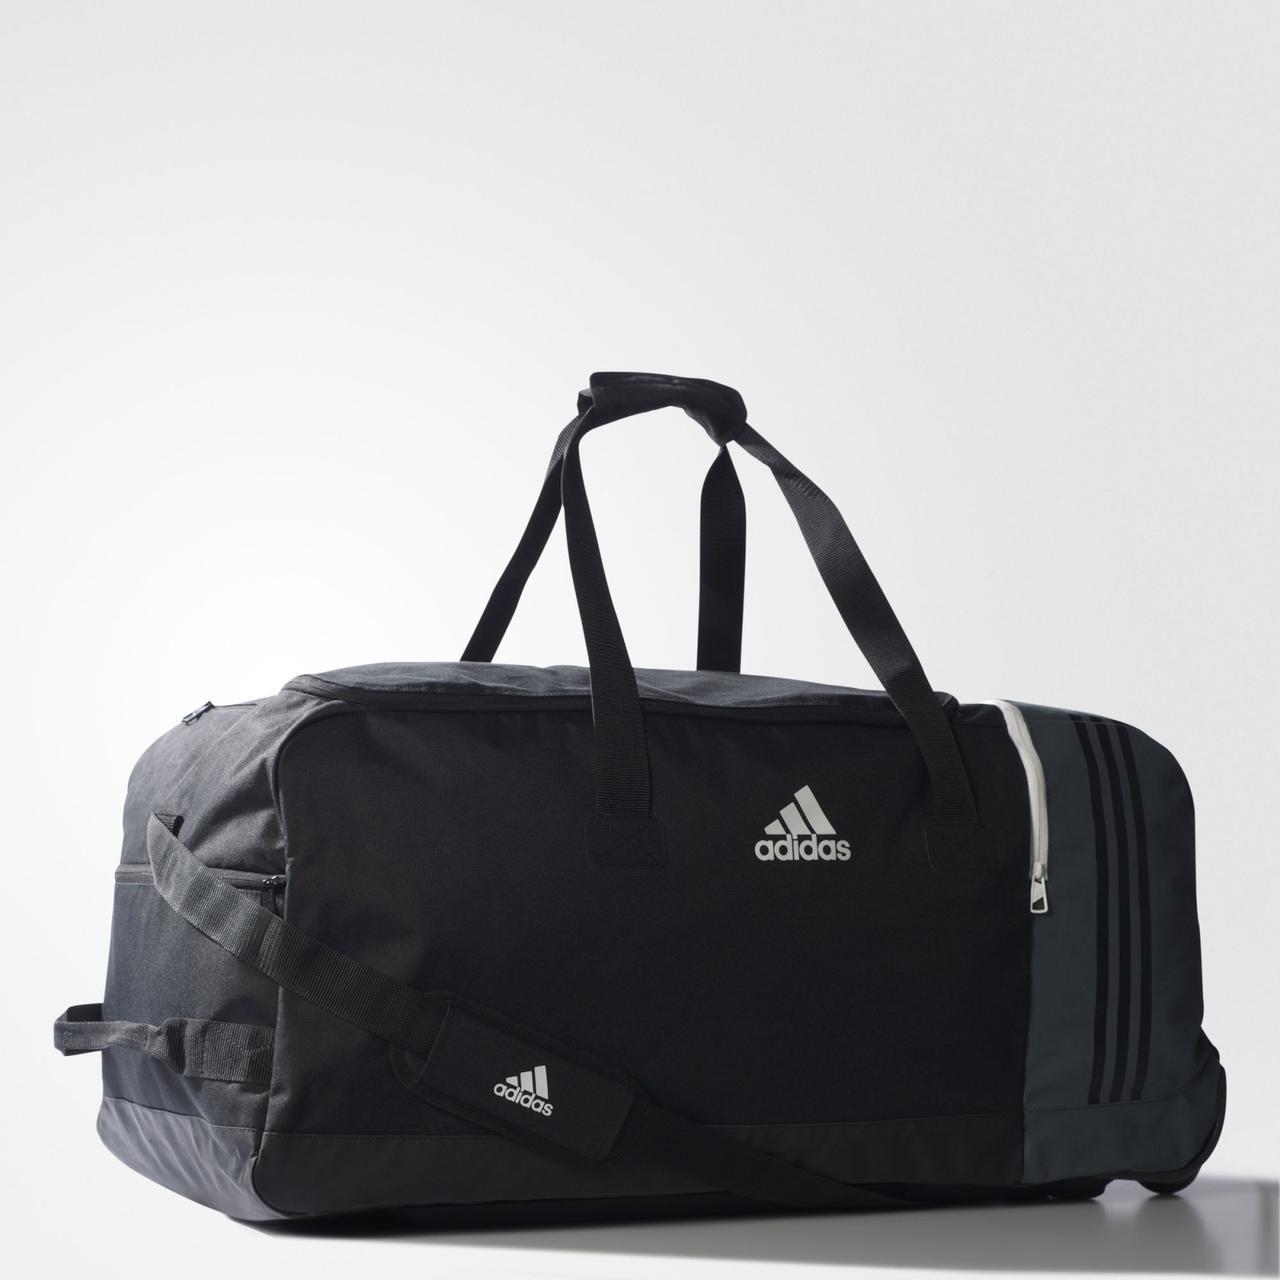 84c321421aea Спортивная сумка на колесах ADIDAS Tiro Team Bag XL Football B46125 -  SUPERSUMKA интернет магазин в